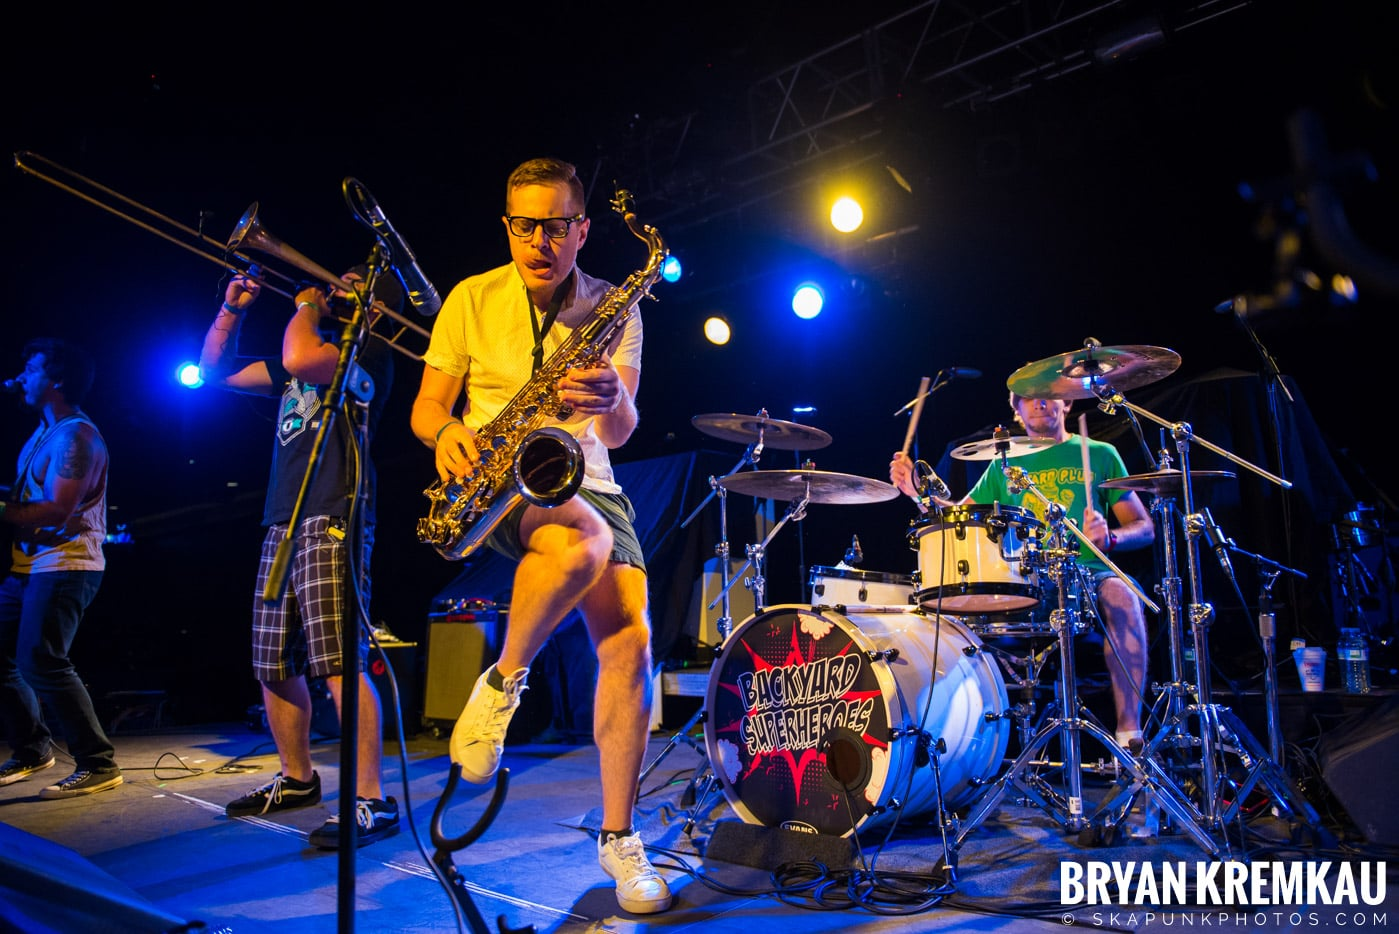 Backyard Superheroes @ Starland Ballroom, Sayreville, NJ - 7.29.17 (21)